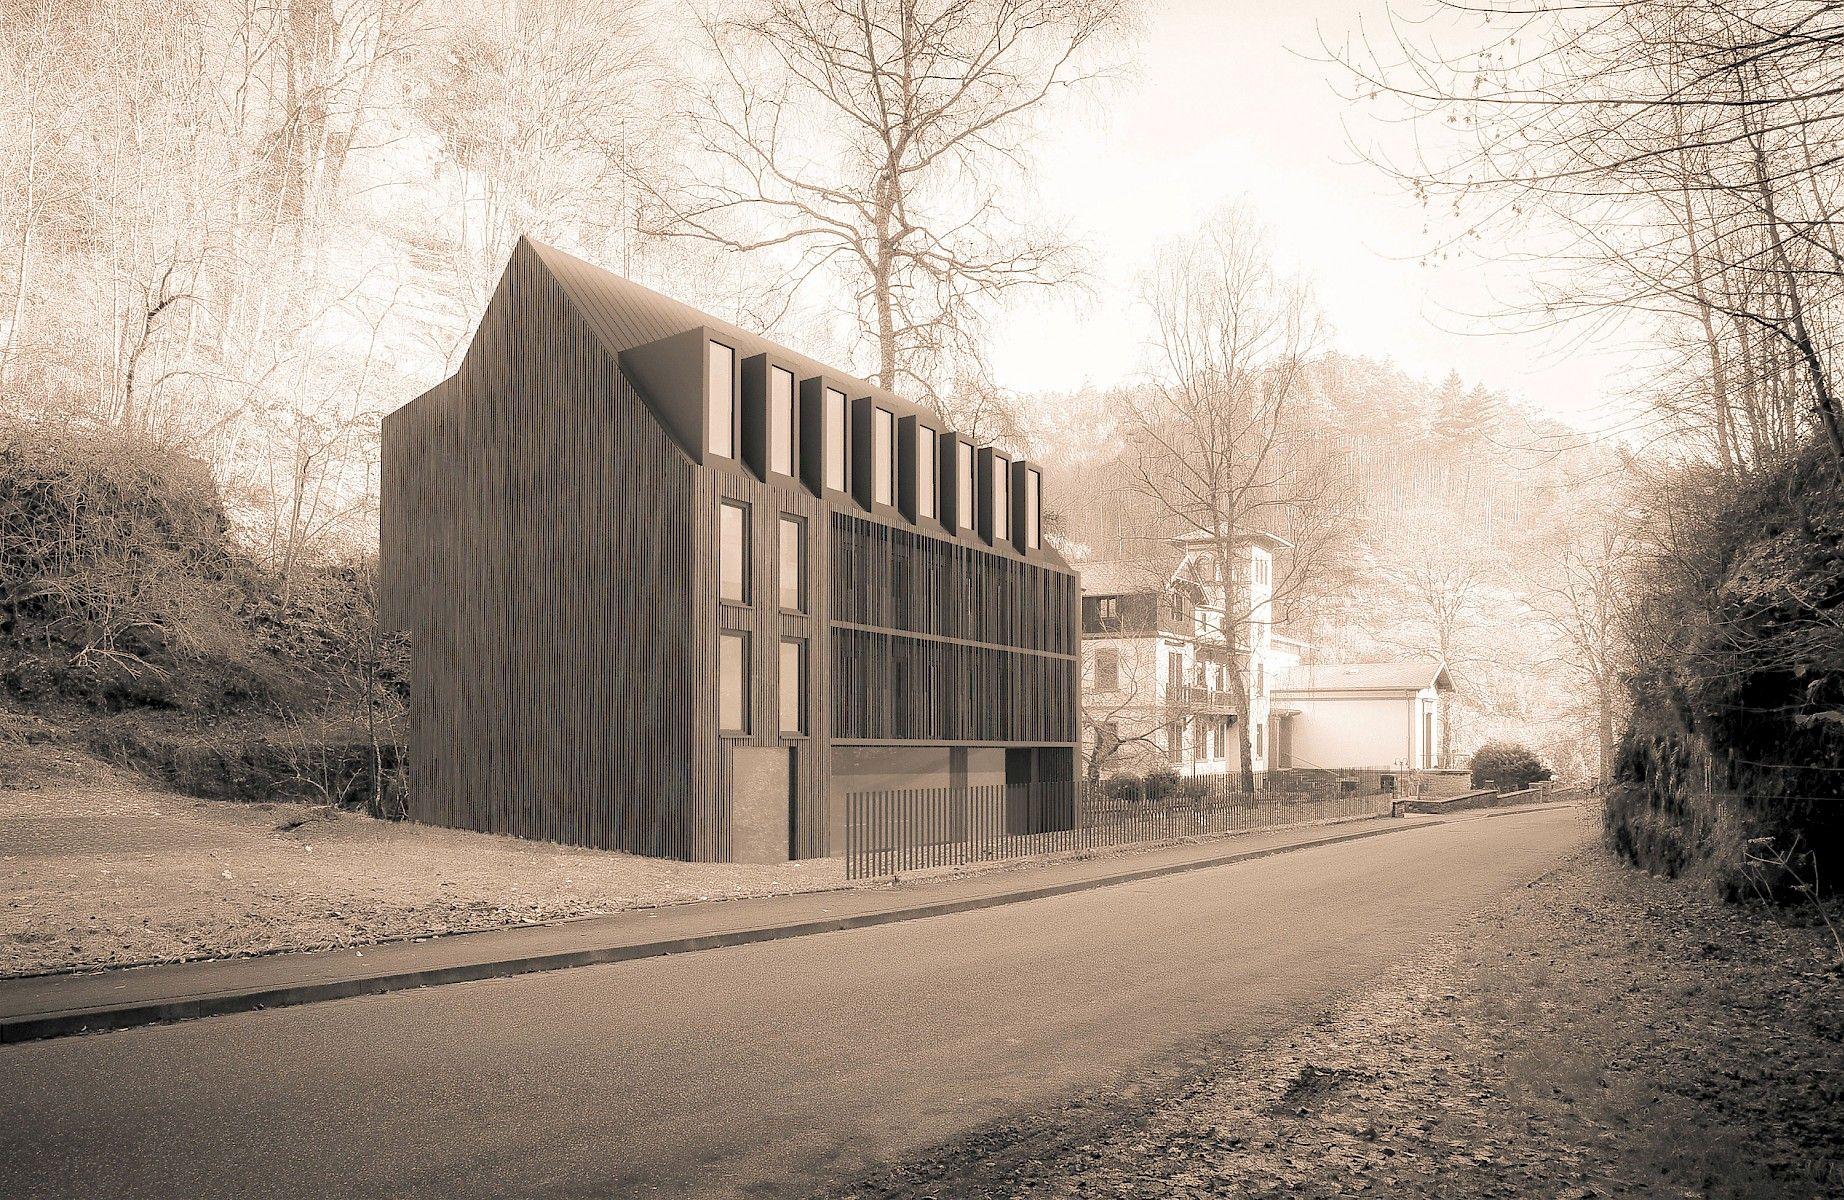 Architekt Kaiserslautern bayer strobel architekten villa denis x